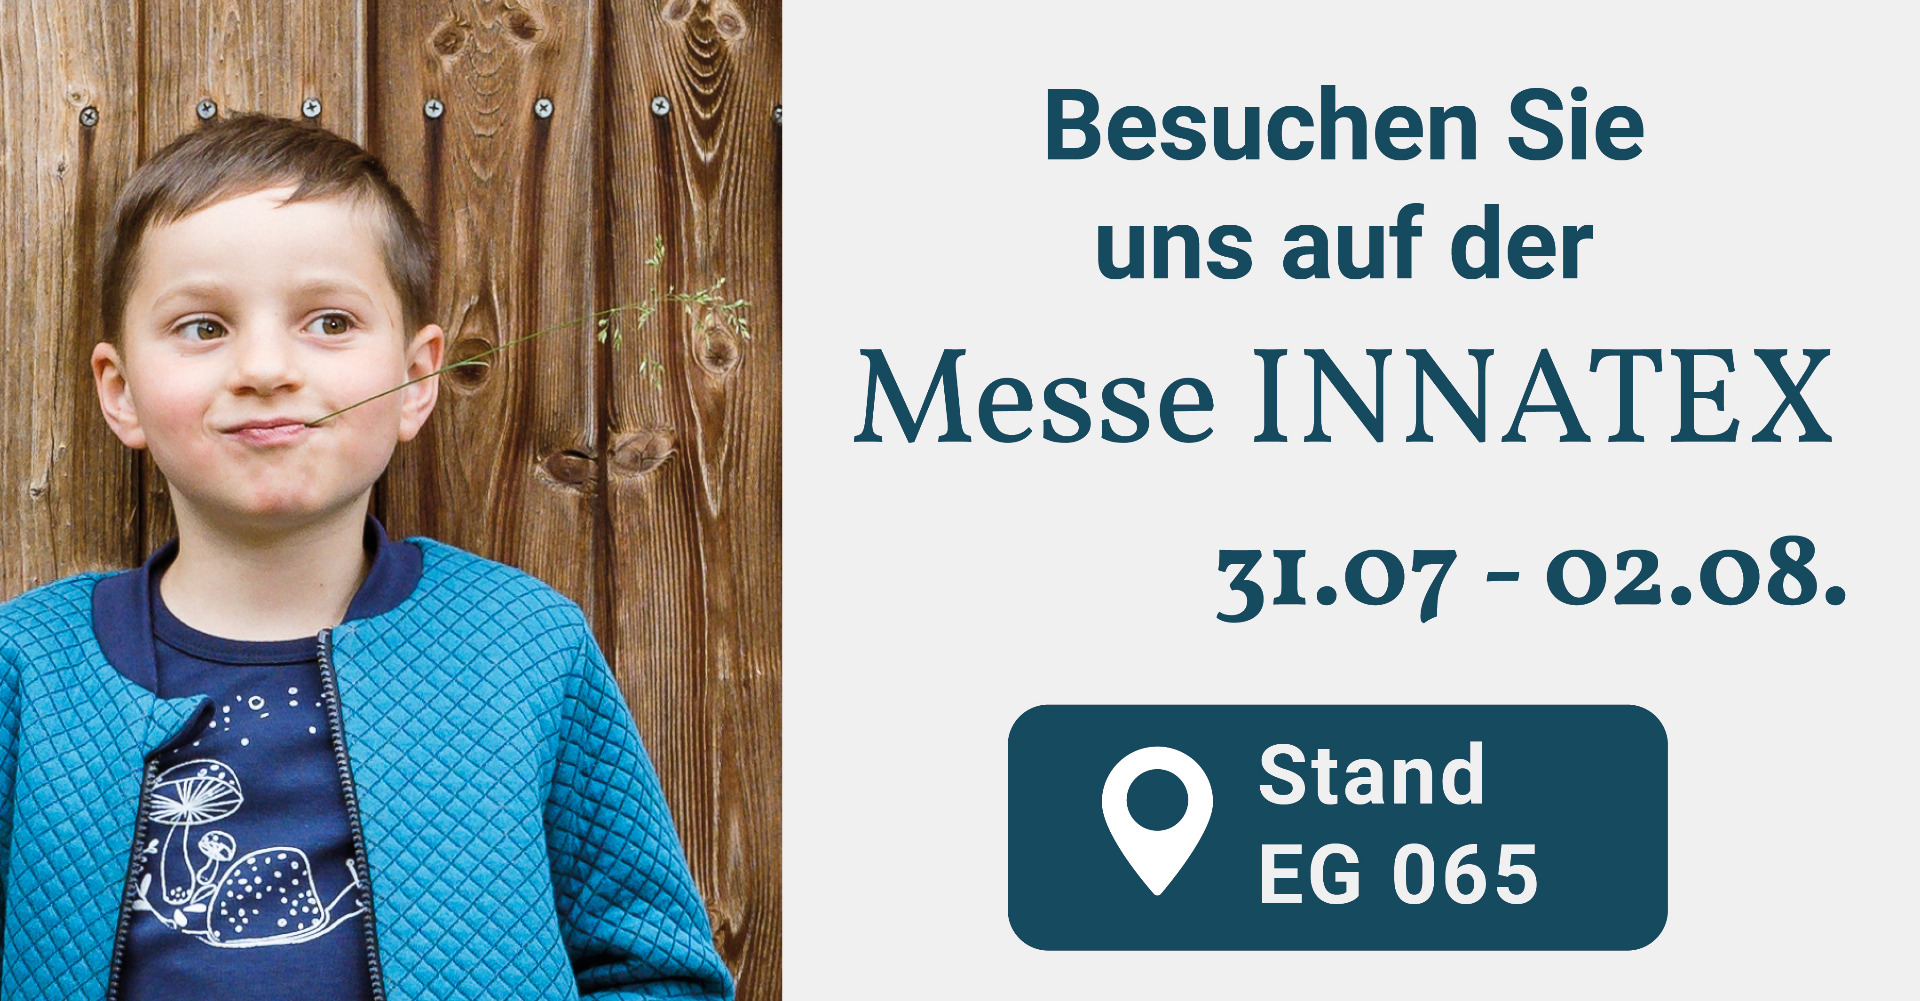 Innatex Messe